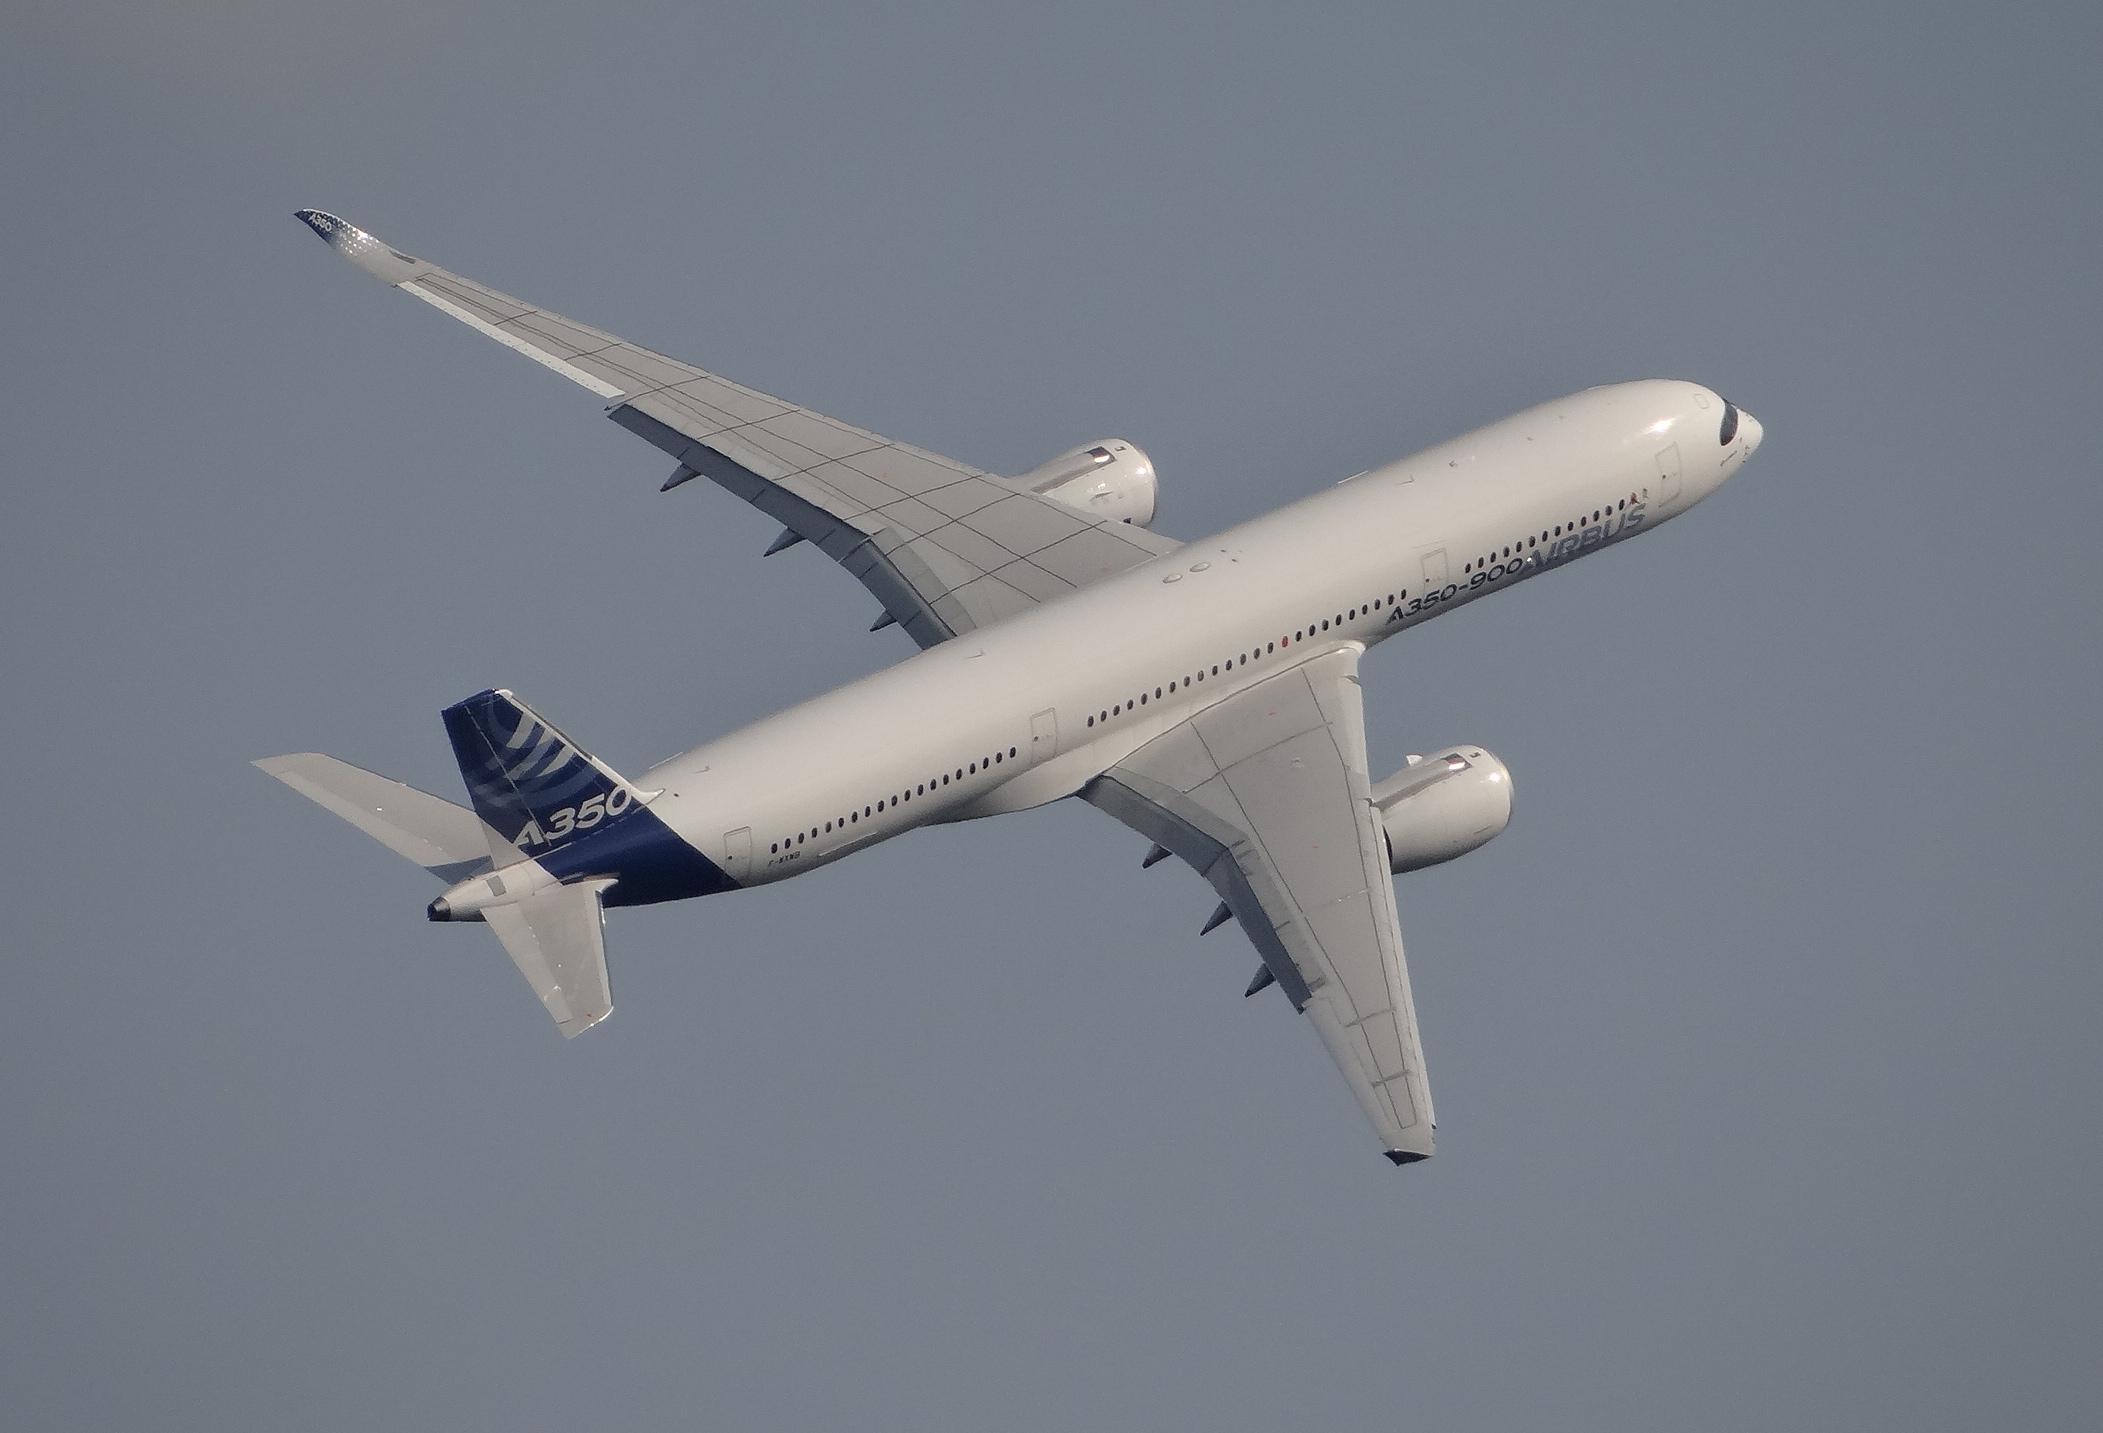 a350 flight maks